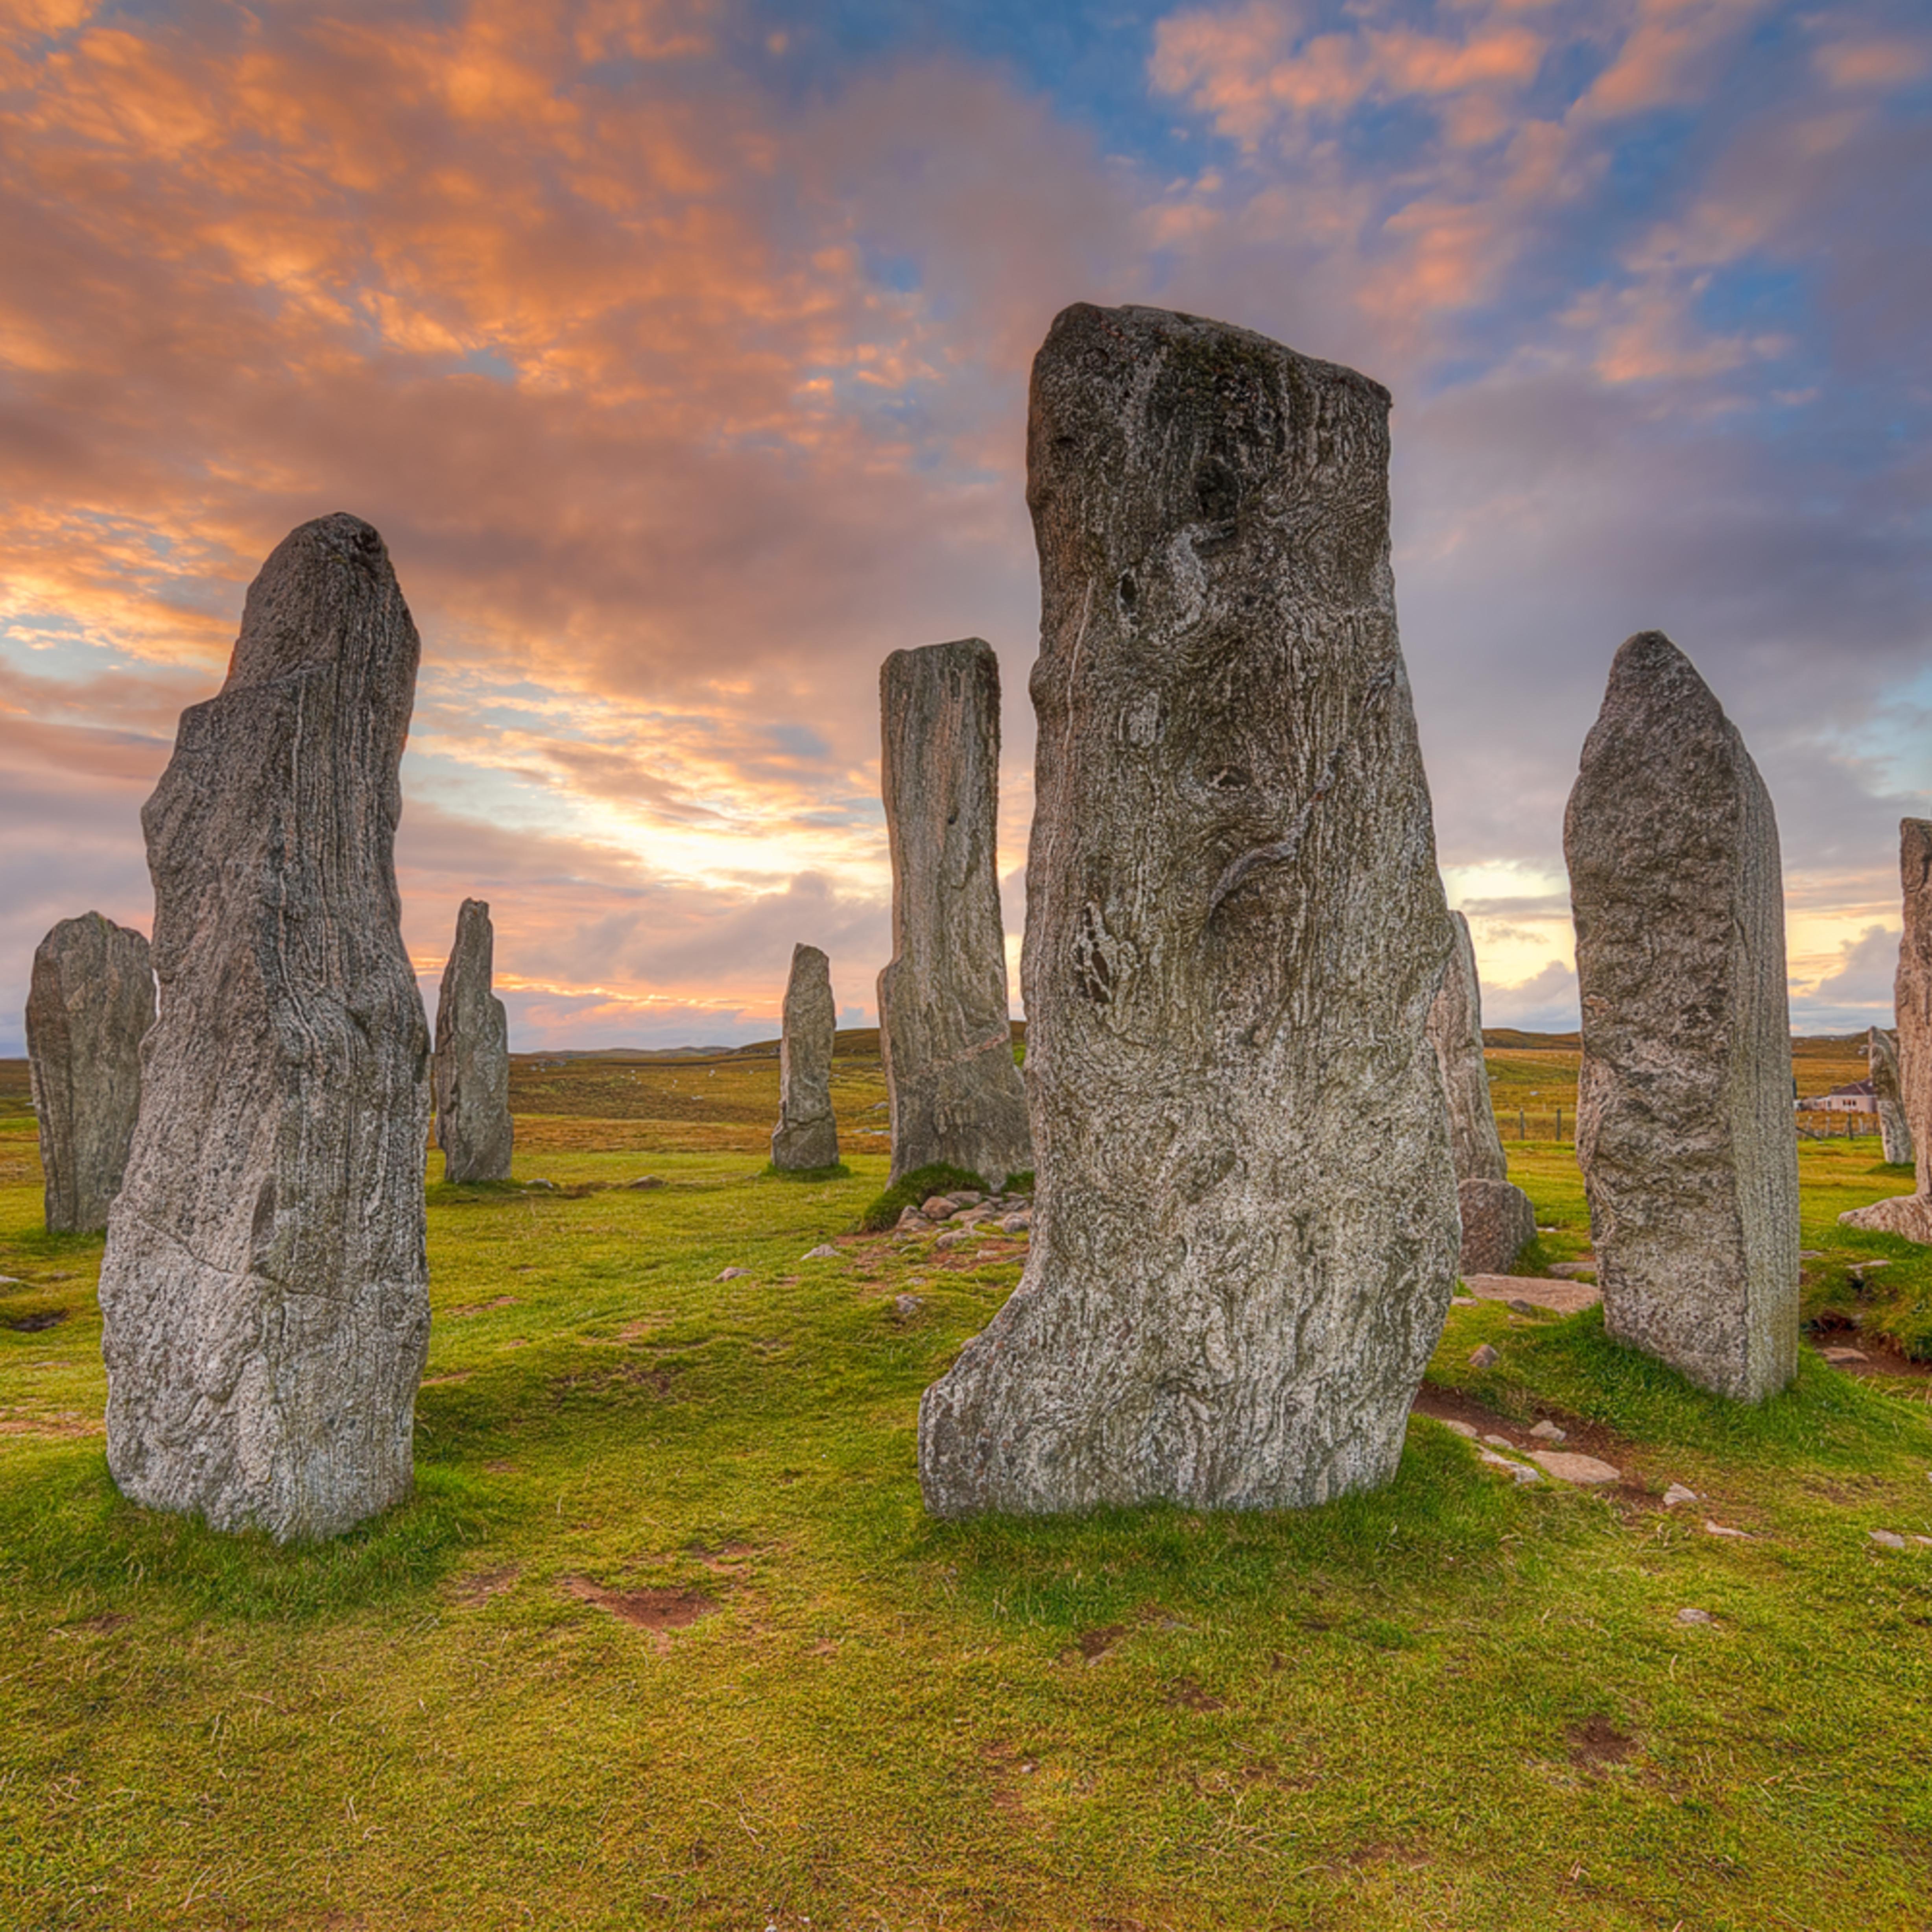 Callanish stones isle of lewis scotland heather k jones q9pgxc